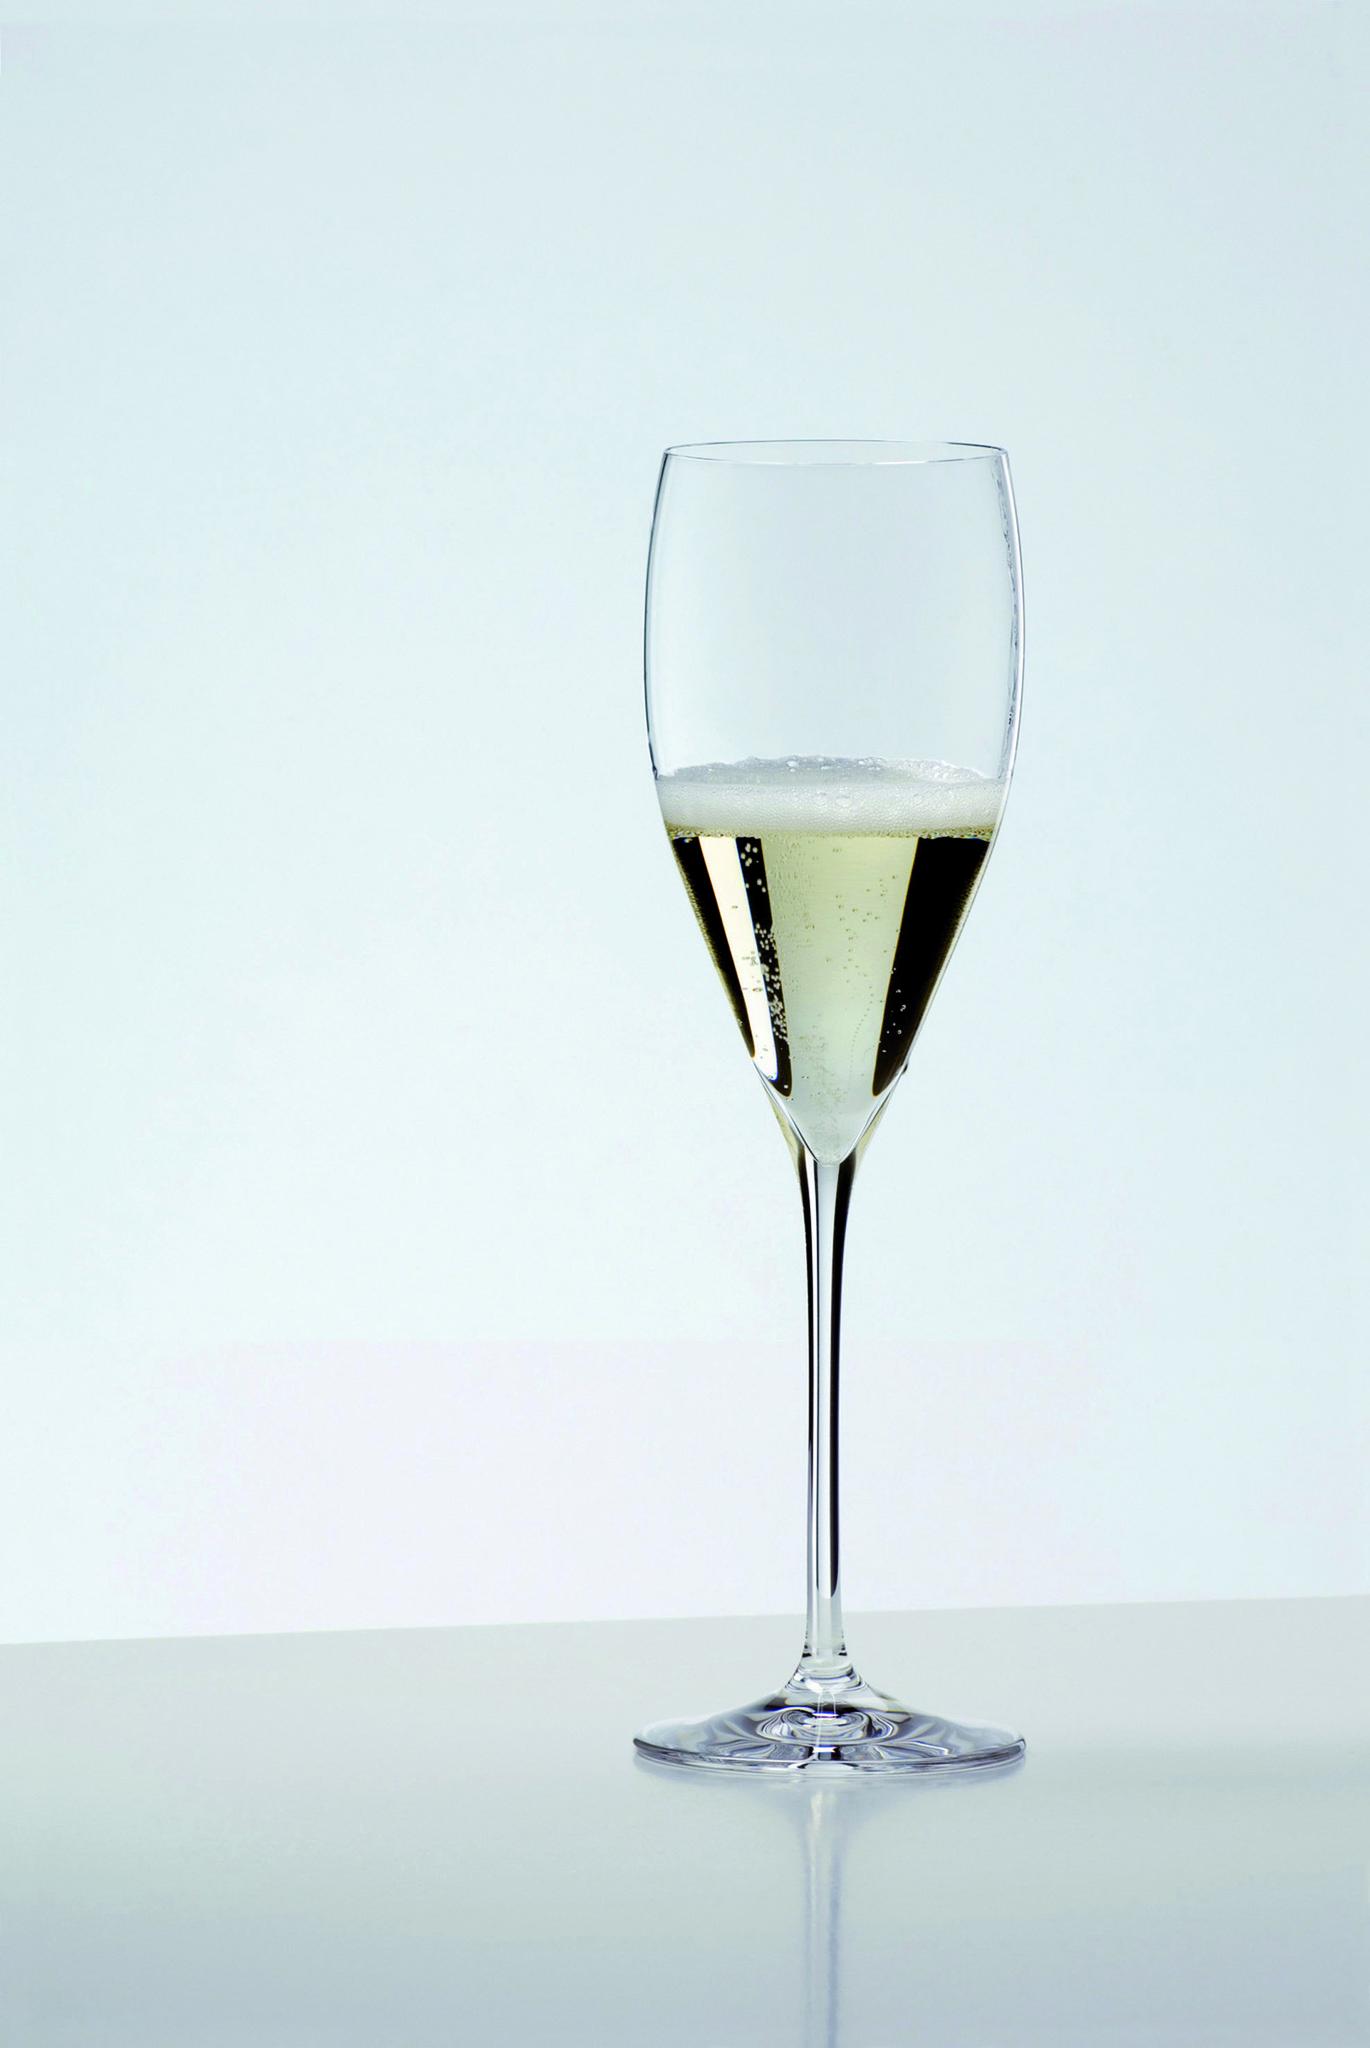 Бокалы Набор бокалов для шампанского 2шт 343мл Riedel Vinum XL Vintage Champagne Glass nabor-bokalov-dlya-shampanskogo-2-sht-343-ml-riedel-vinum-xl-vintage-champagne-glass-avstriya.jpg